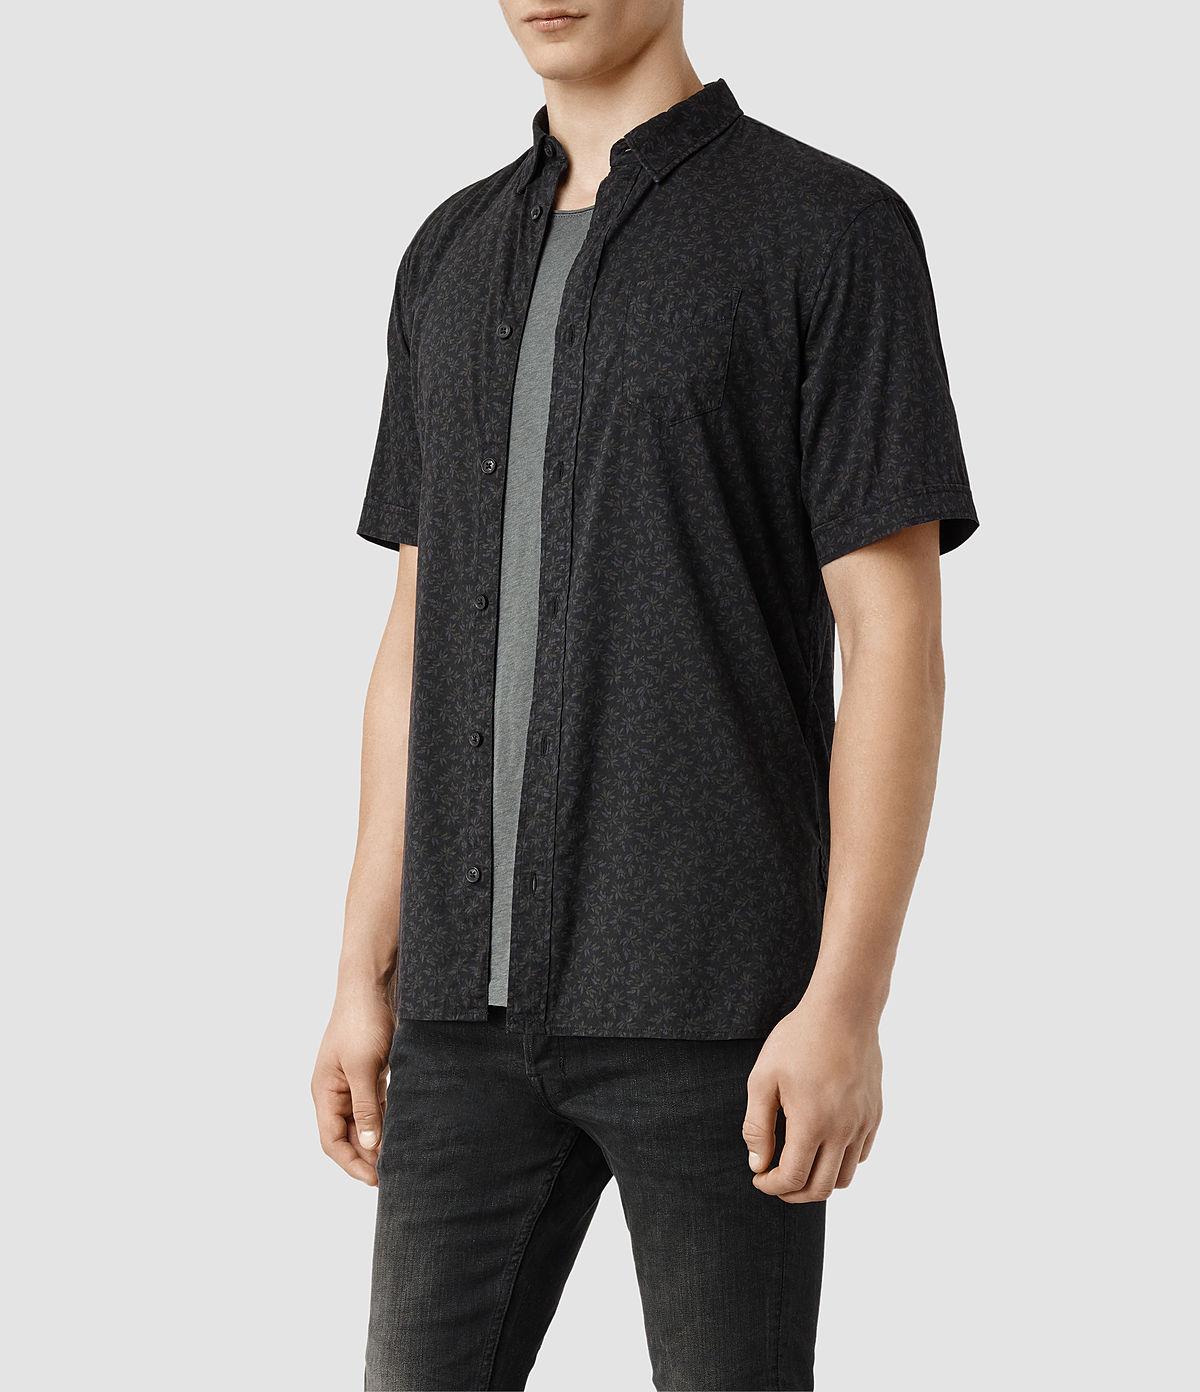 All-Saints Black Shirt